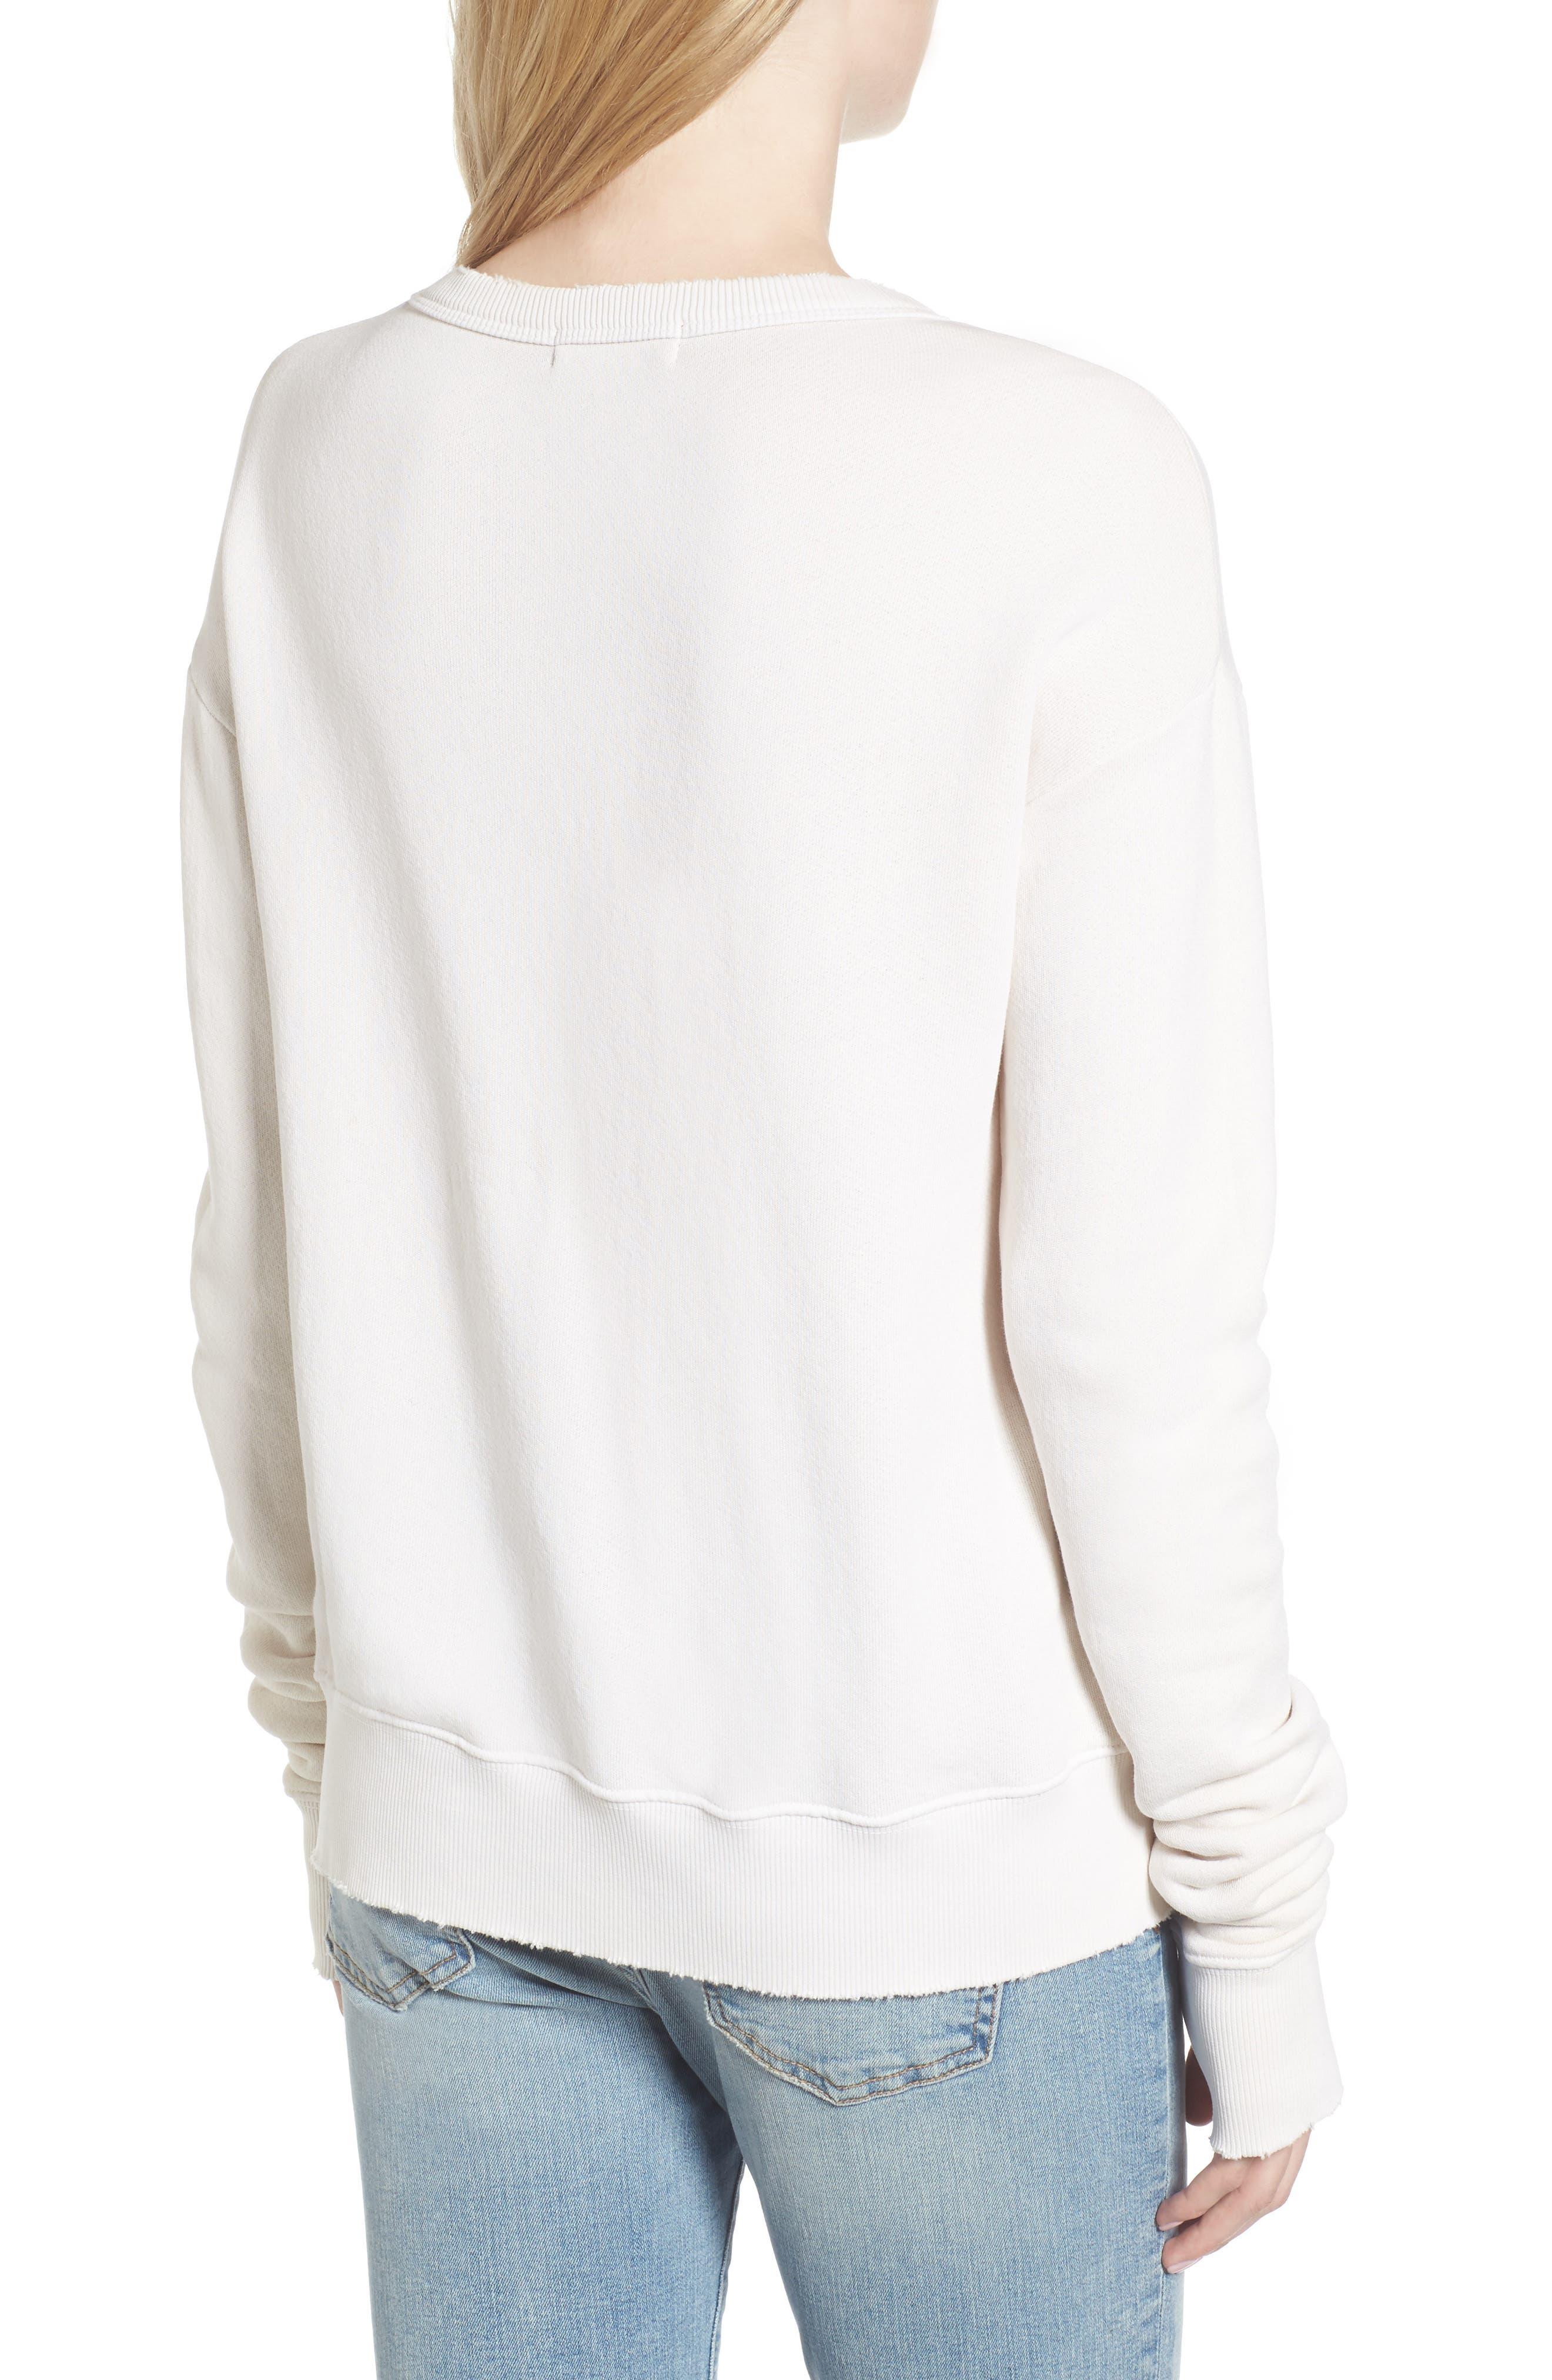 Vernon Bad Habits Distressed Sweatshirt,                             Alternate thumbnail 2, color,